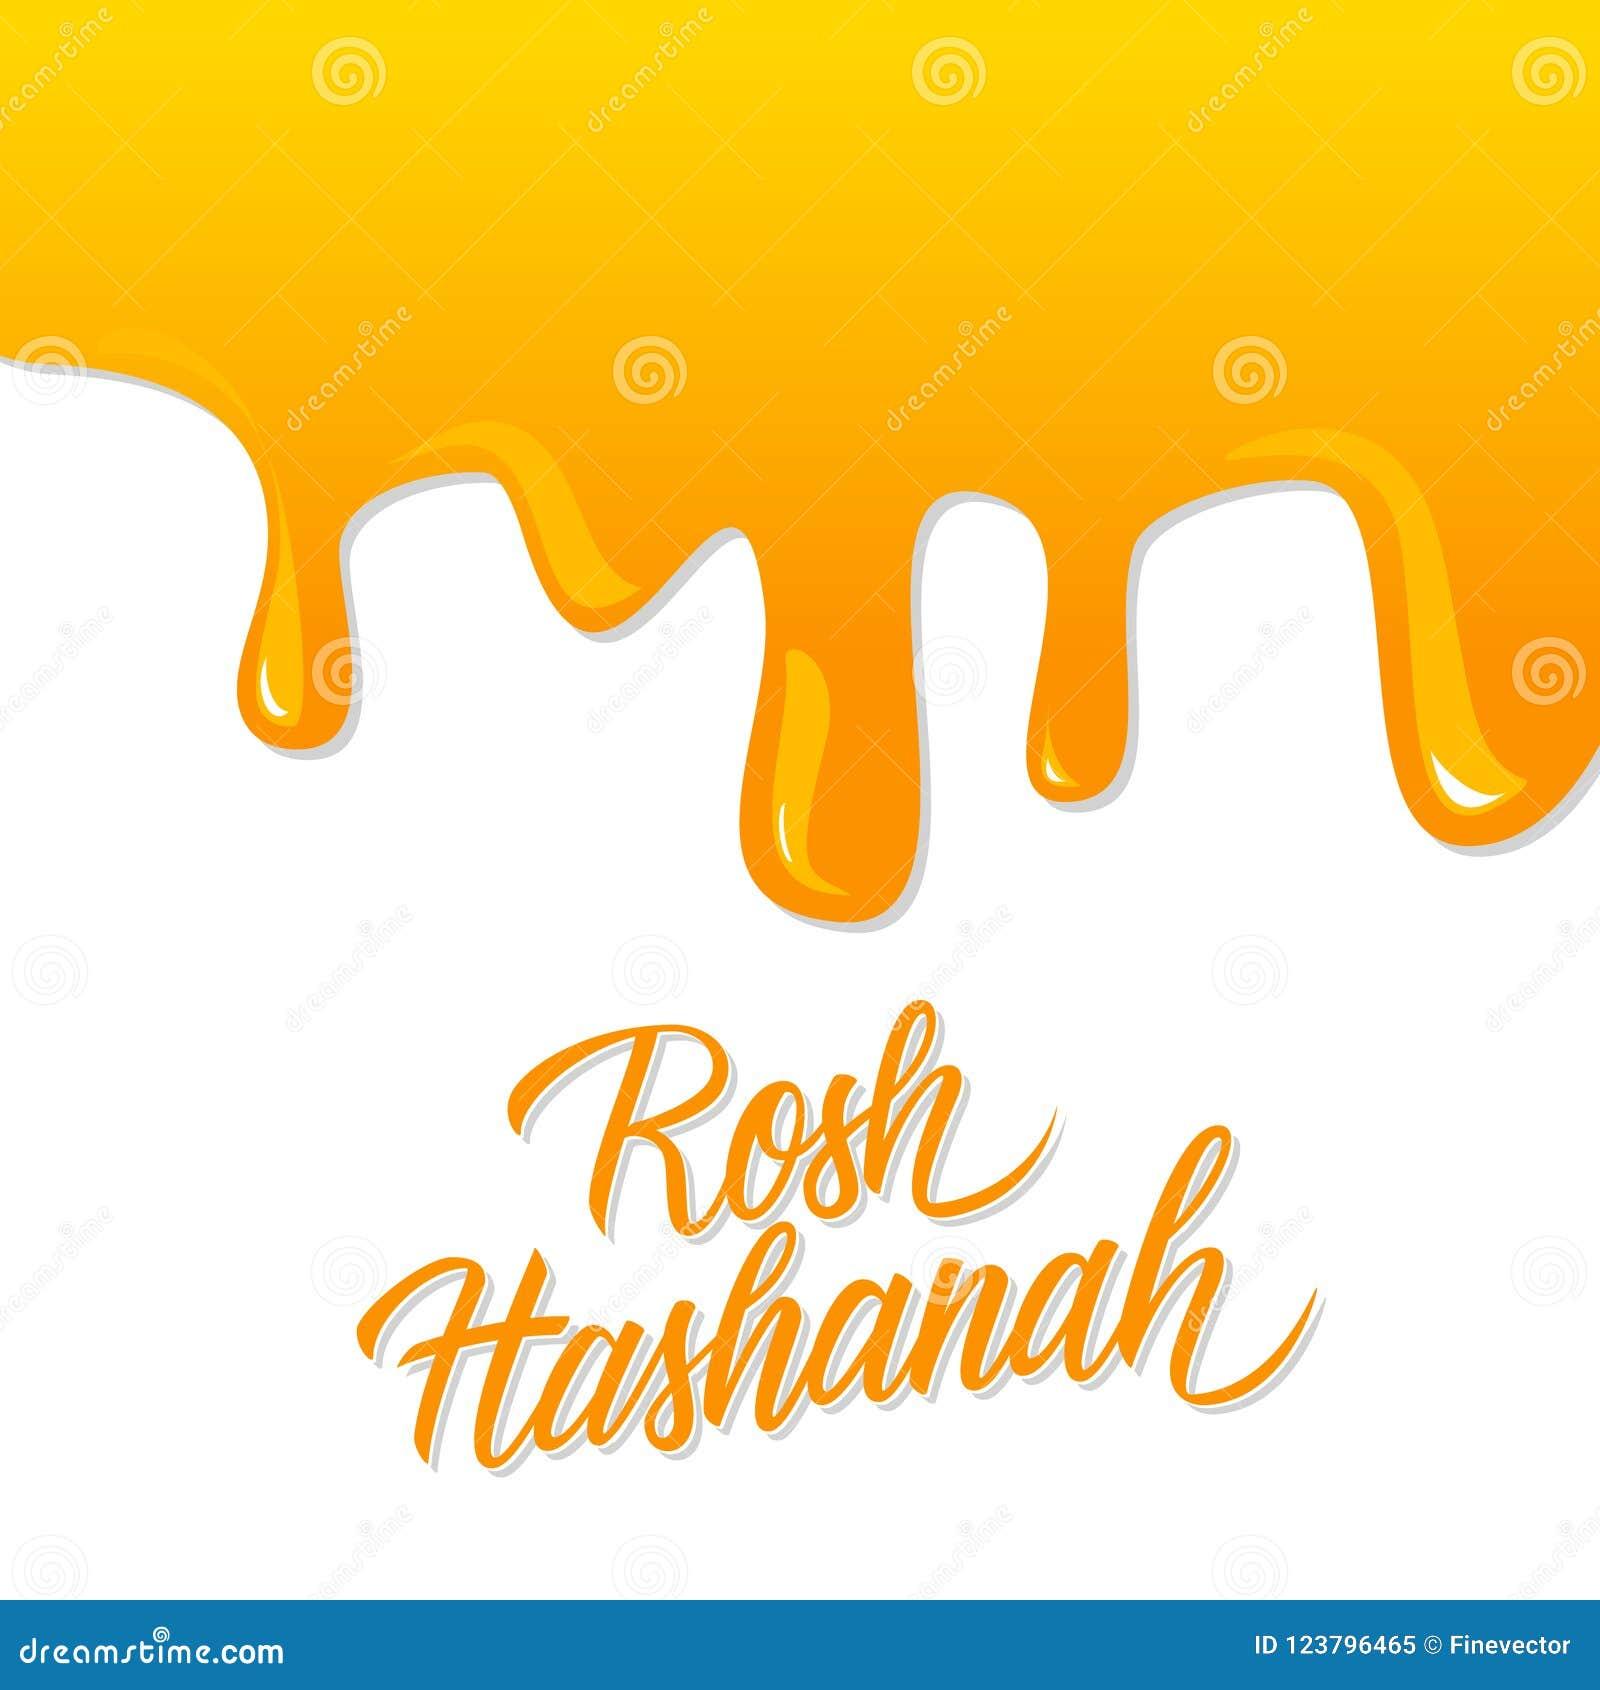 Rosh Hashanah Hand Lettering With Liquid Honey Background Jewish